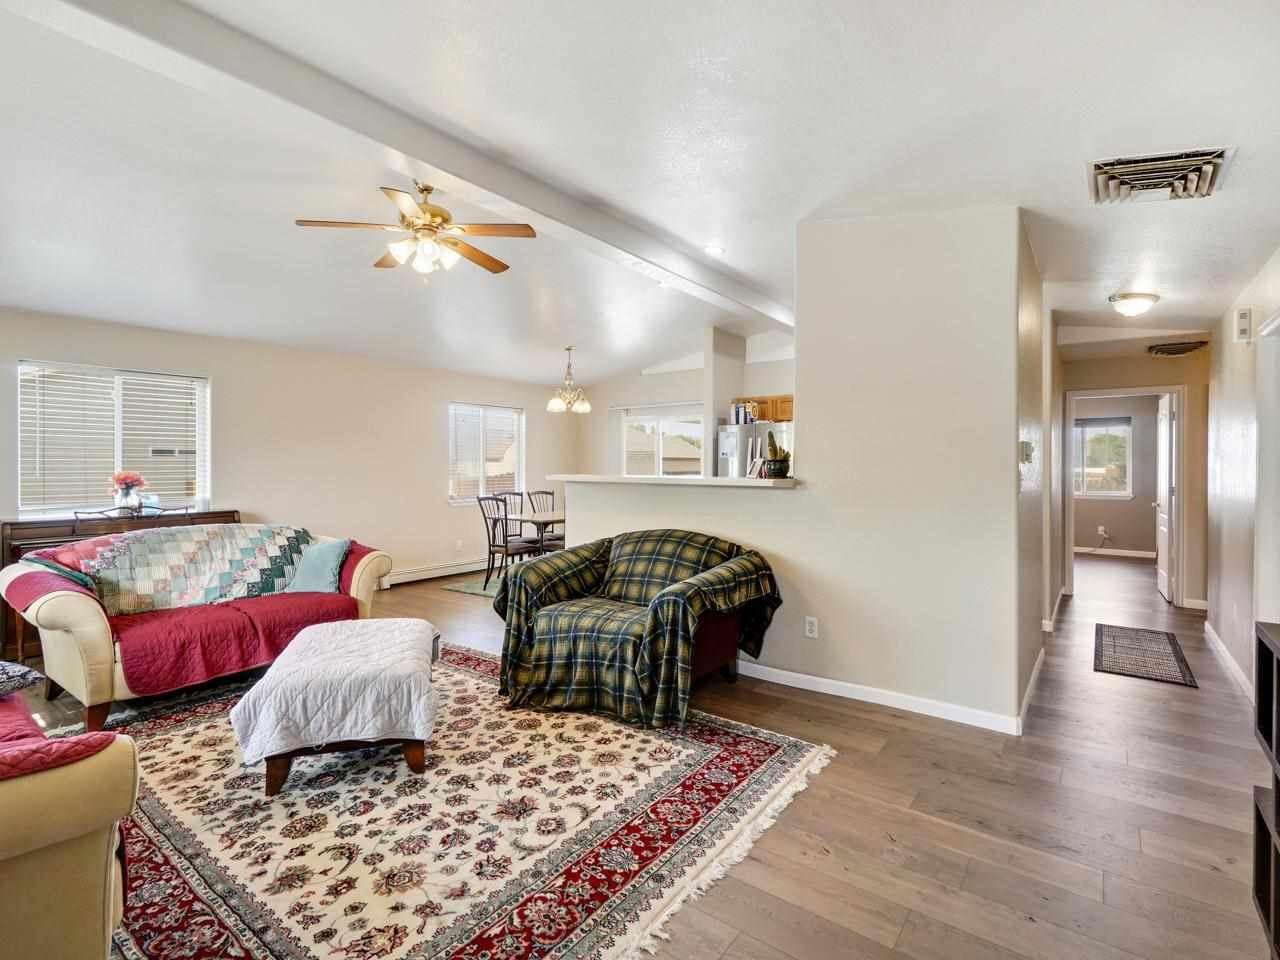 Photo of 387 Sorrel Street, Grand Junction, CO 81501 (MLS # 20213781)